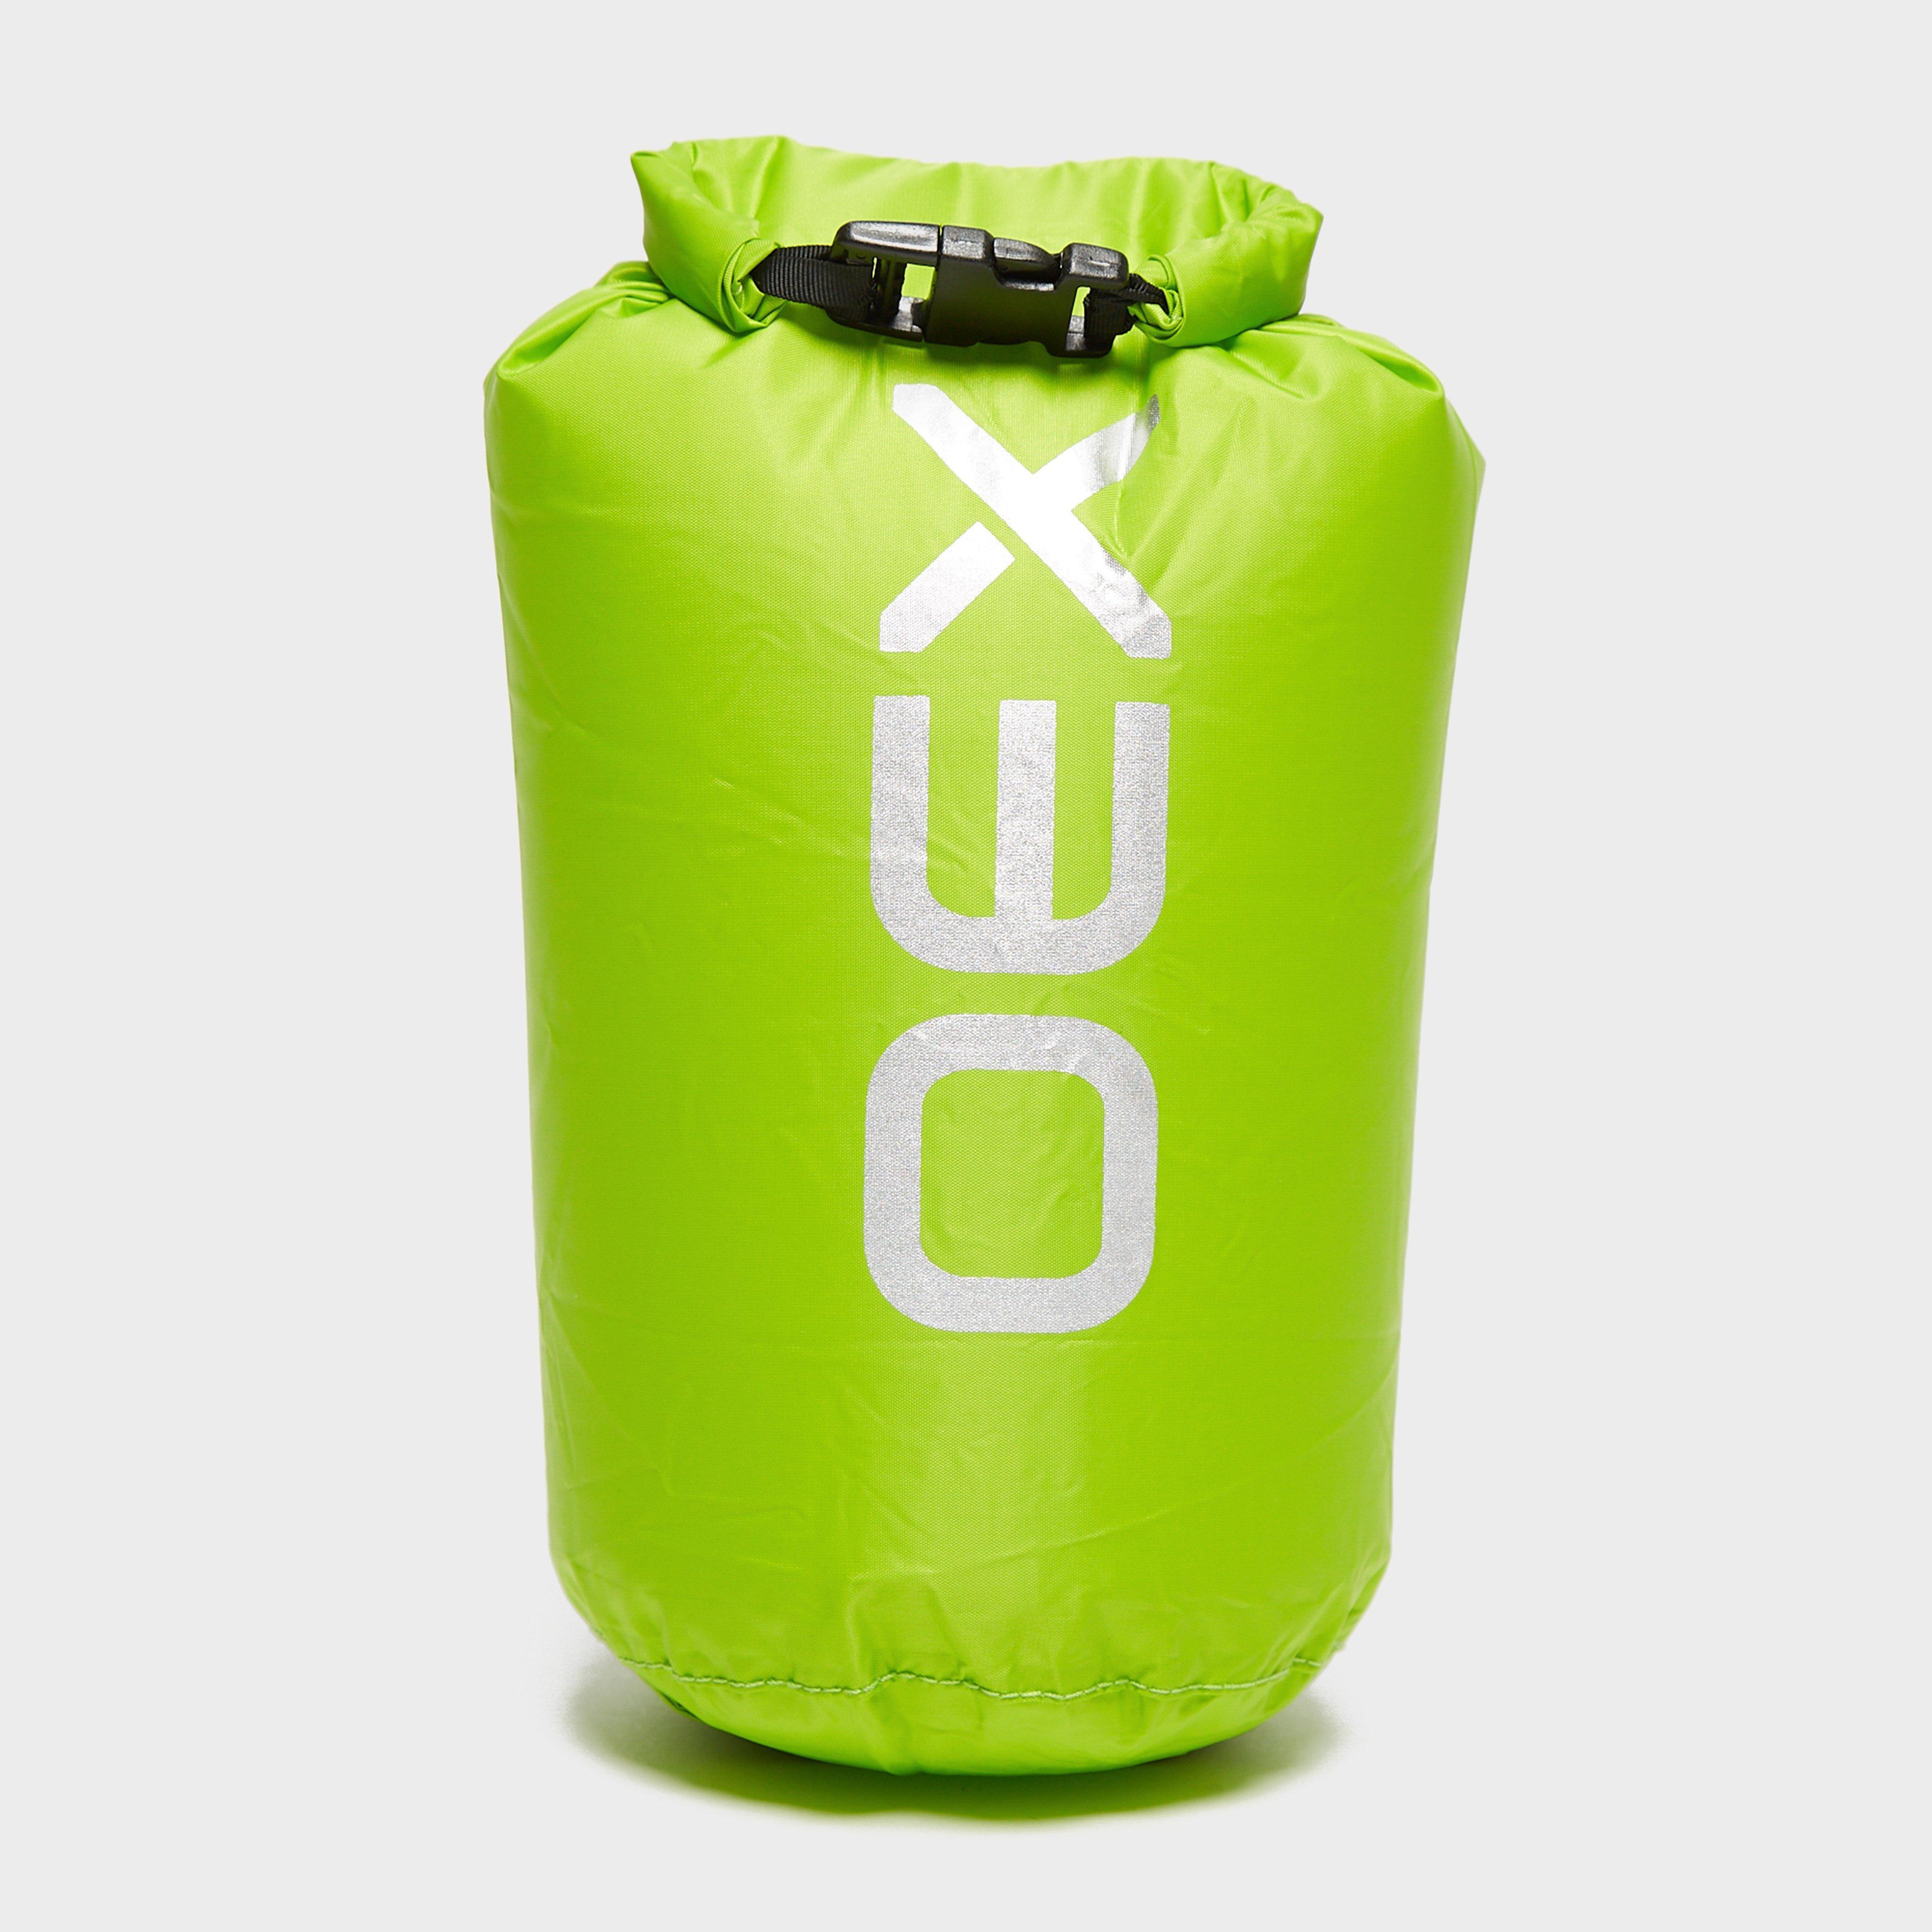 Oex Oex Drysac 2, Lime